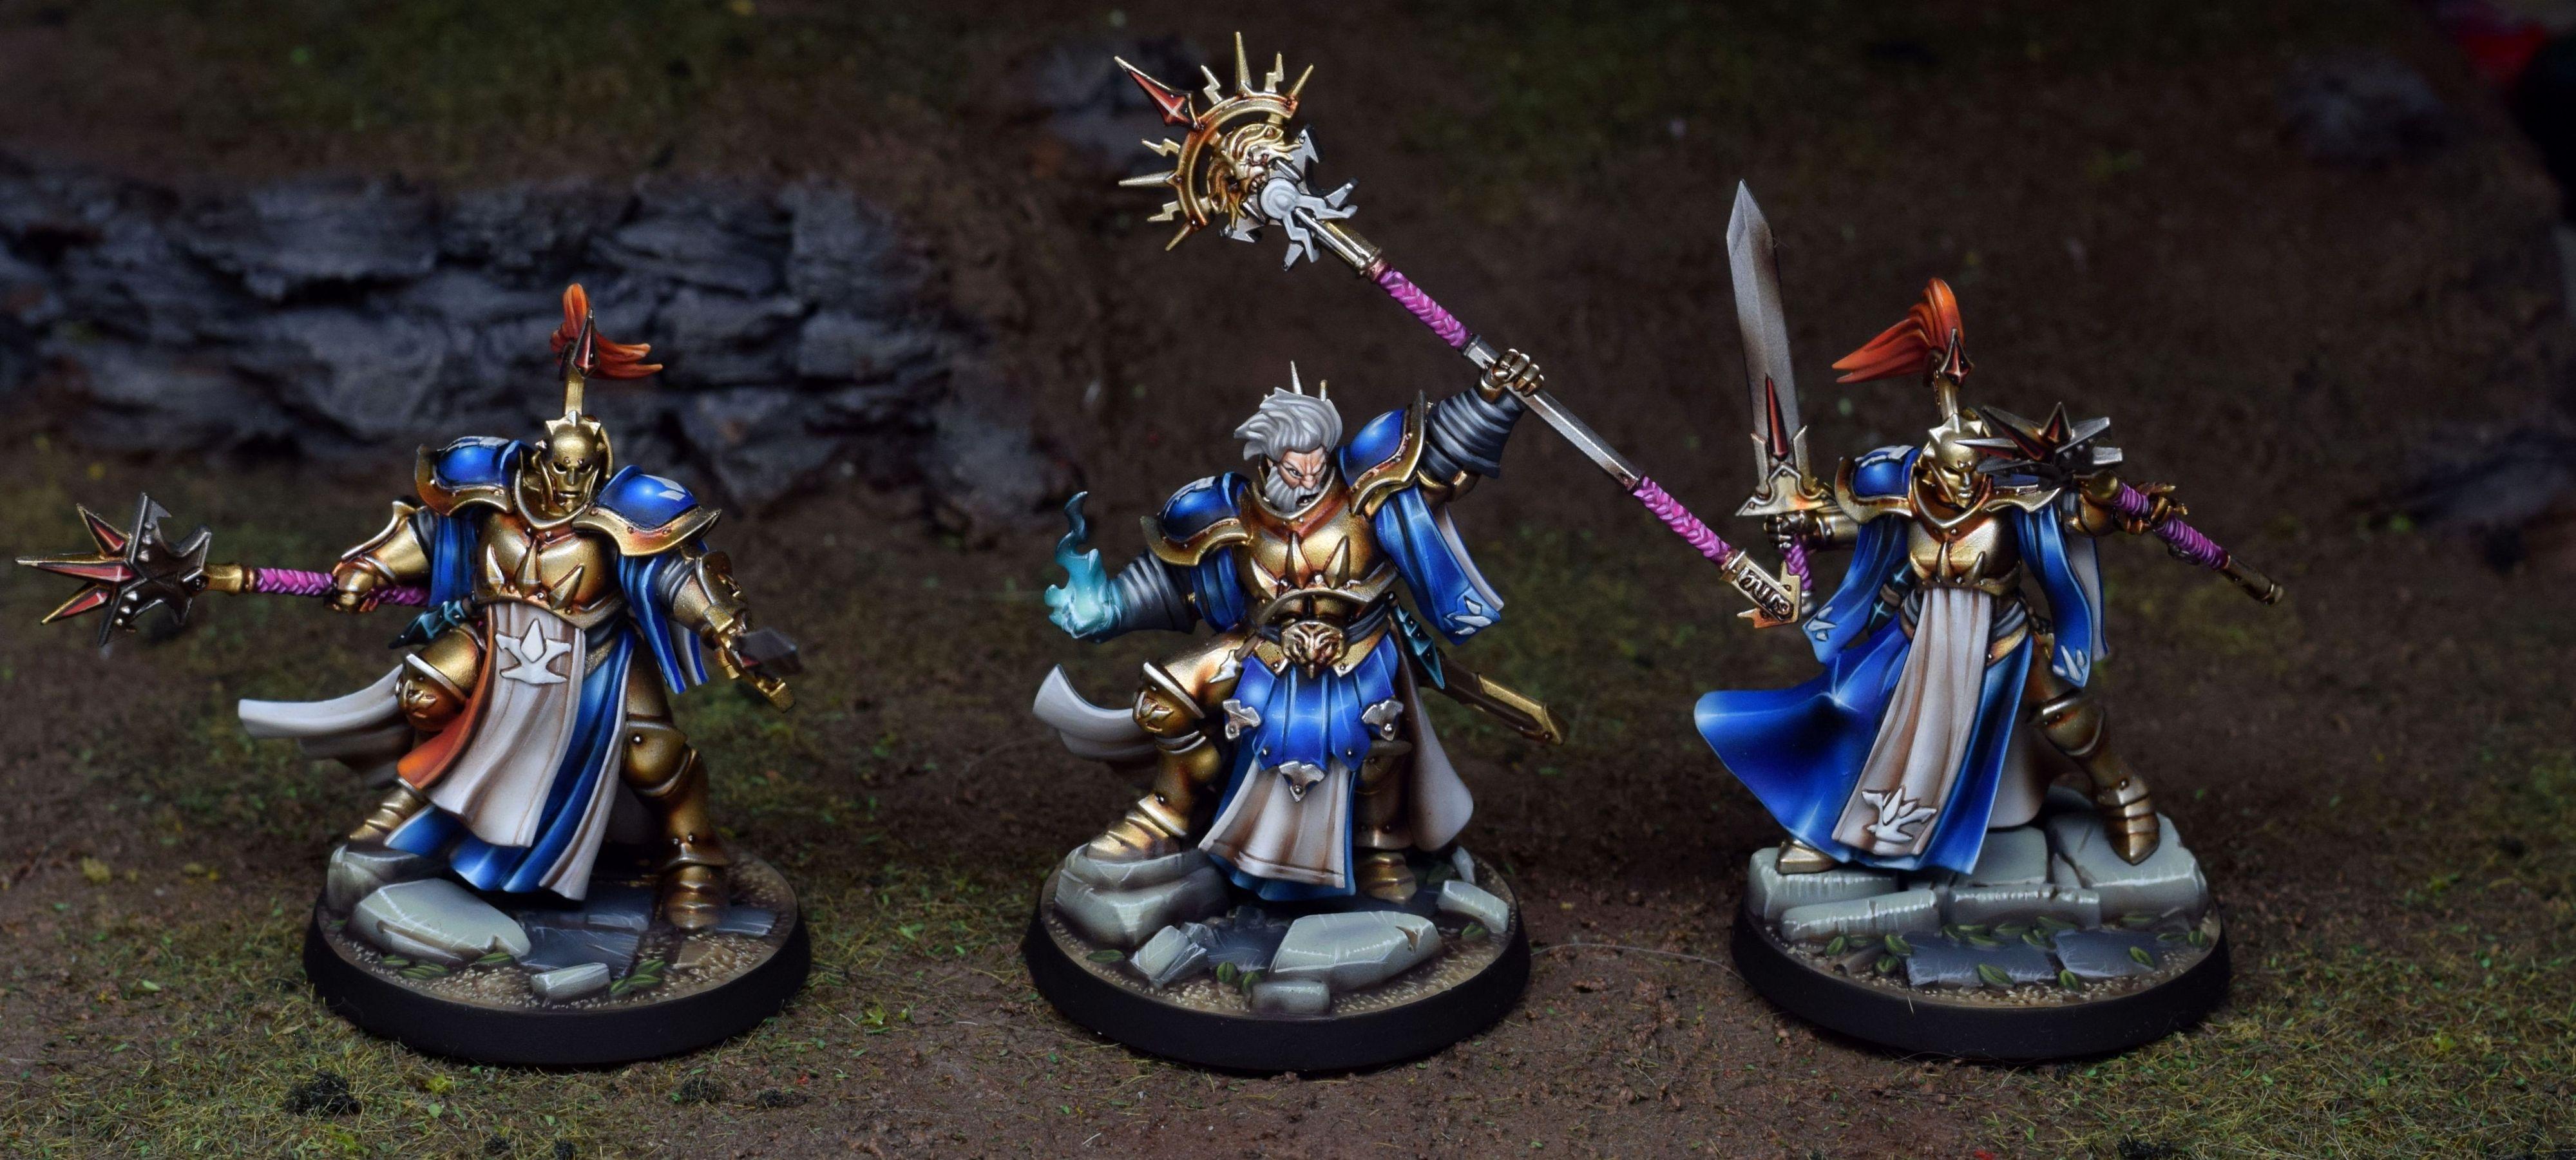 Warhammer Underworlds Nightvault Stormsire's Cursebreakers